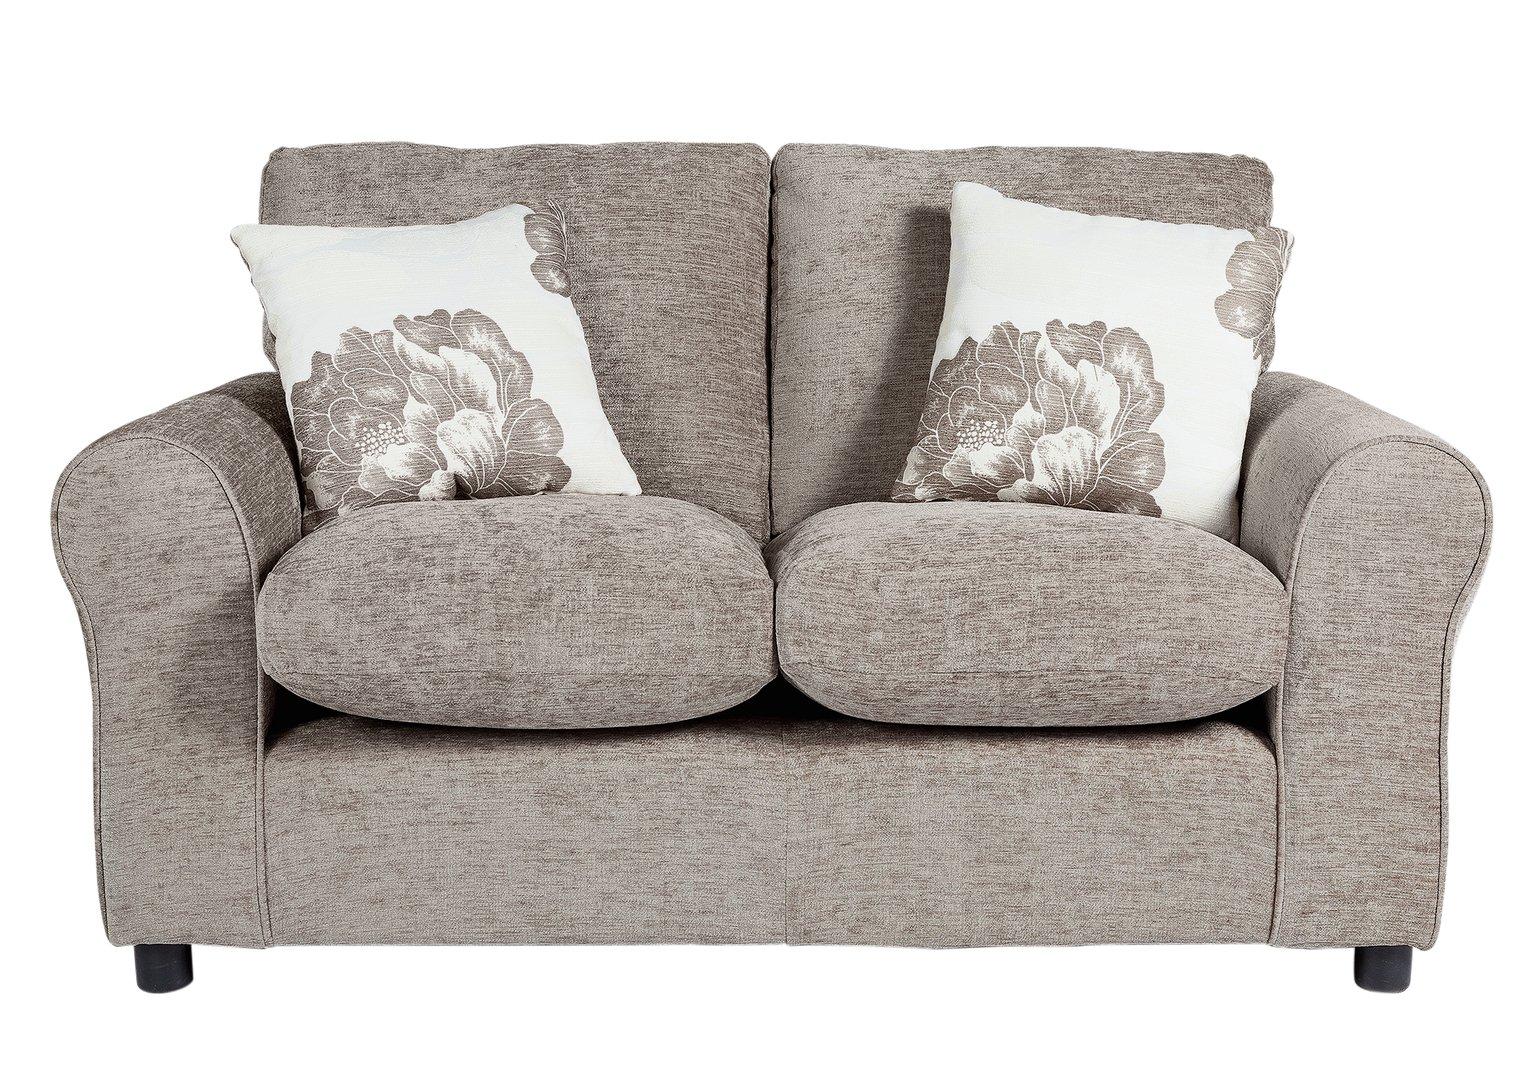 fabric chesterfield sofa argos modesto ii rv sleeper bed sale on home tessa compact 2 seater mink